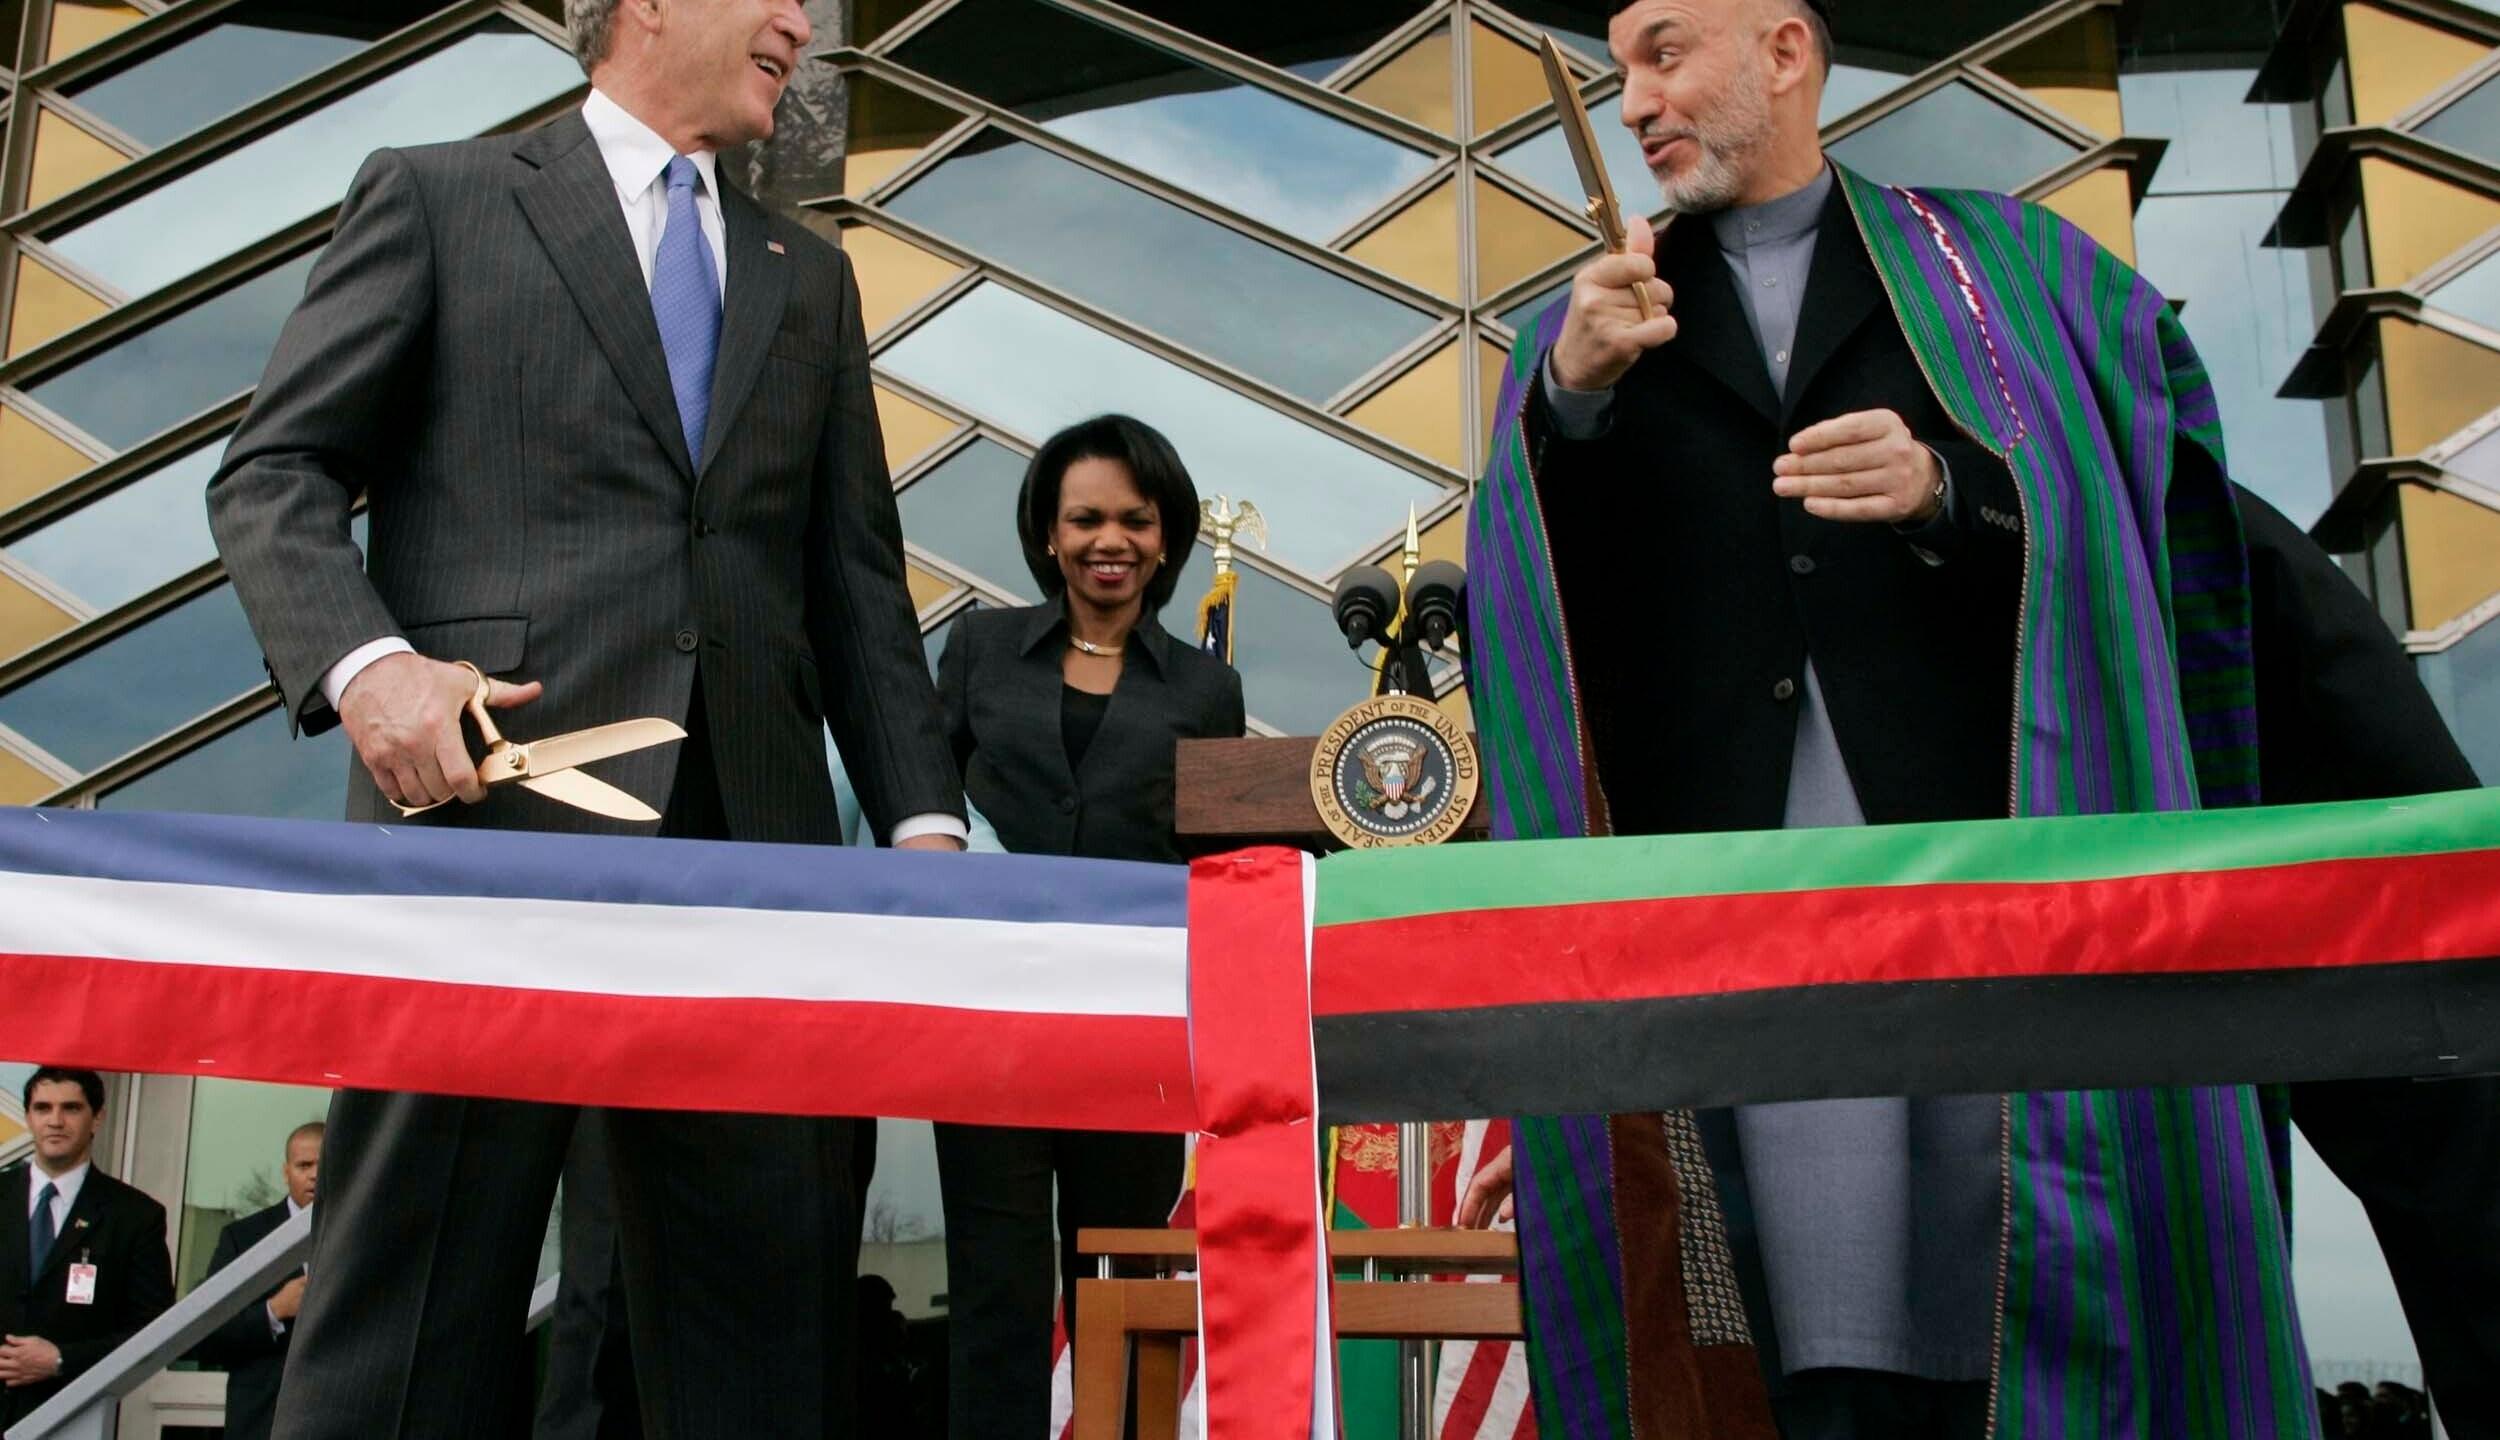 George W. Bush, Hamid Karzai